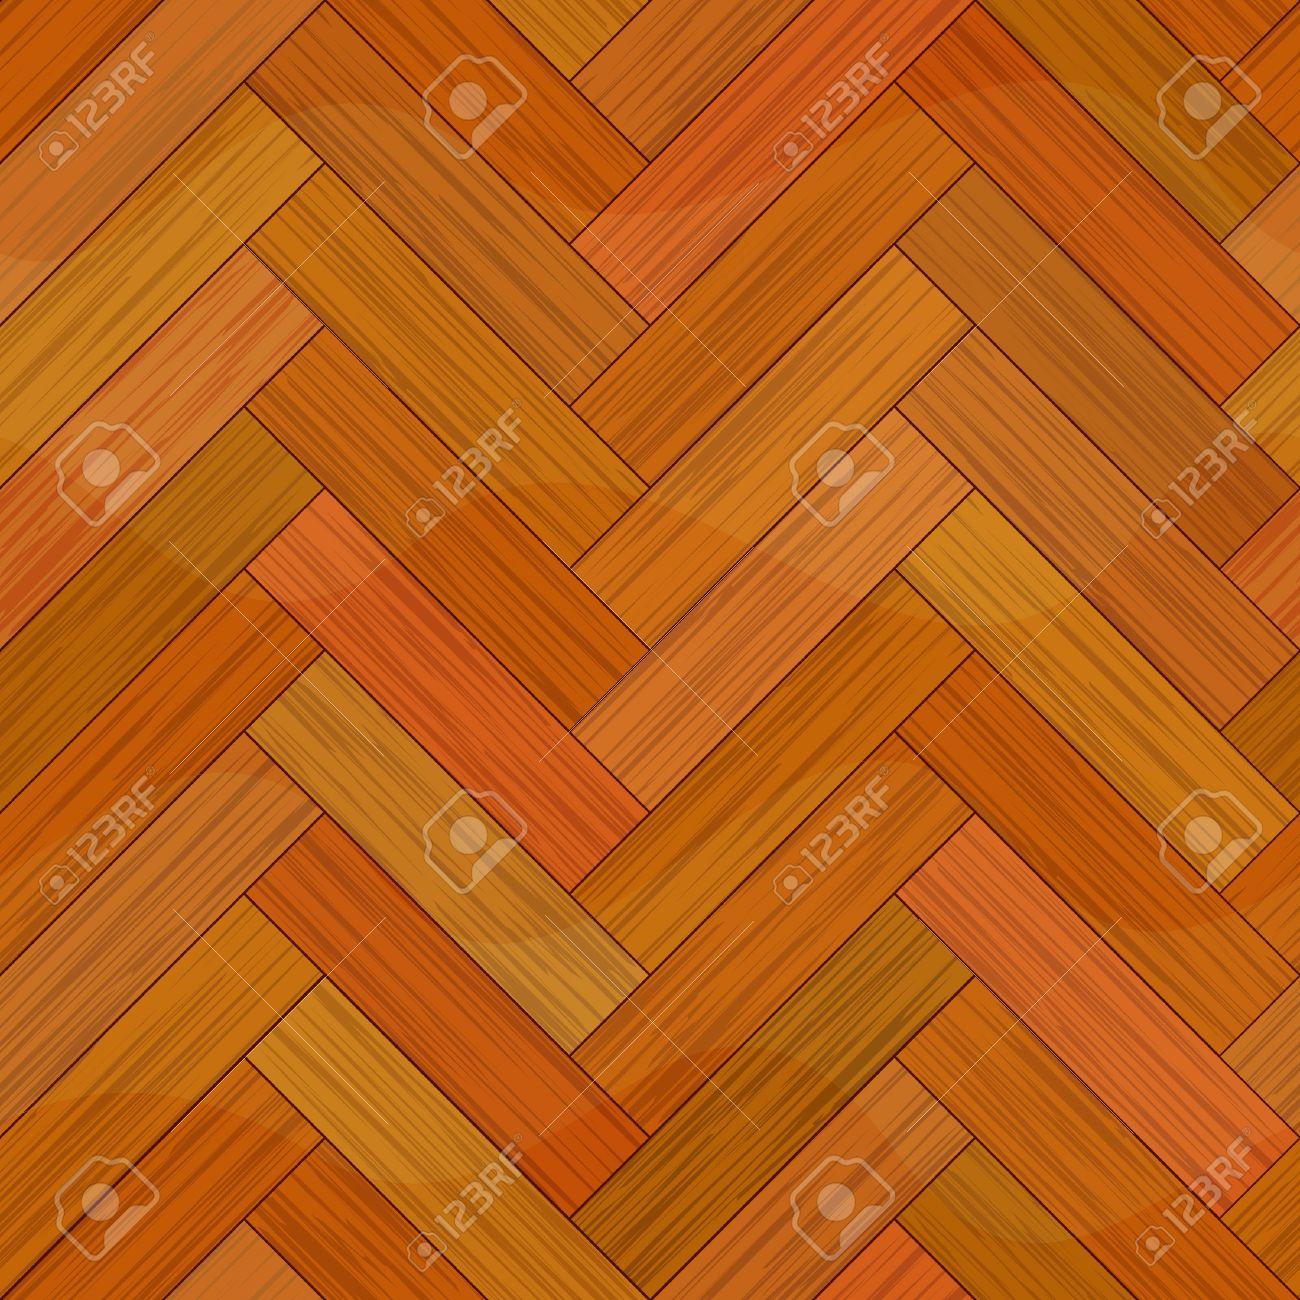 Teak parquet floor tiles gallery tile flooring design ideas wooden parquet floor tiles choice image tile flooring design ideas wood parquet floor tiles gallery home dailygadgetfo Image collections